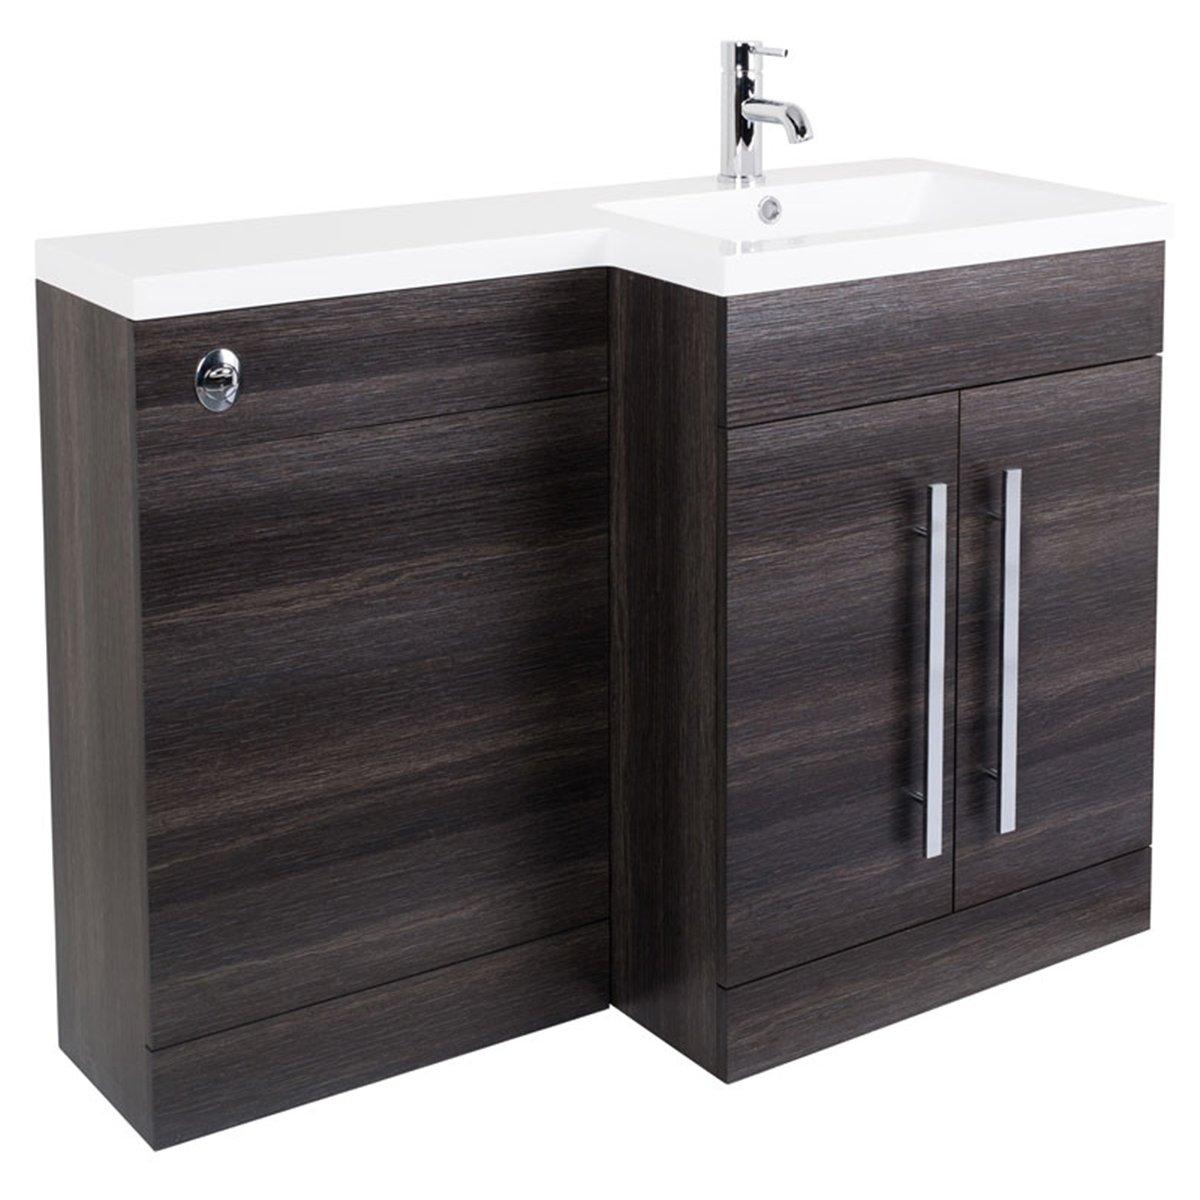 Bathroom Vanity Unit Designer Furniture Suite Back To Wall